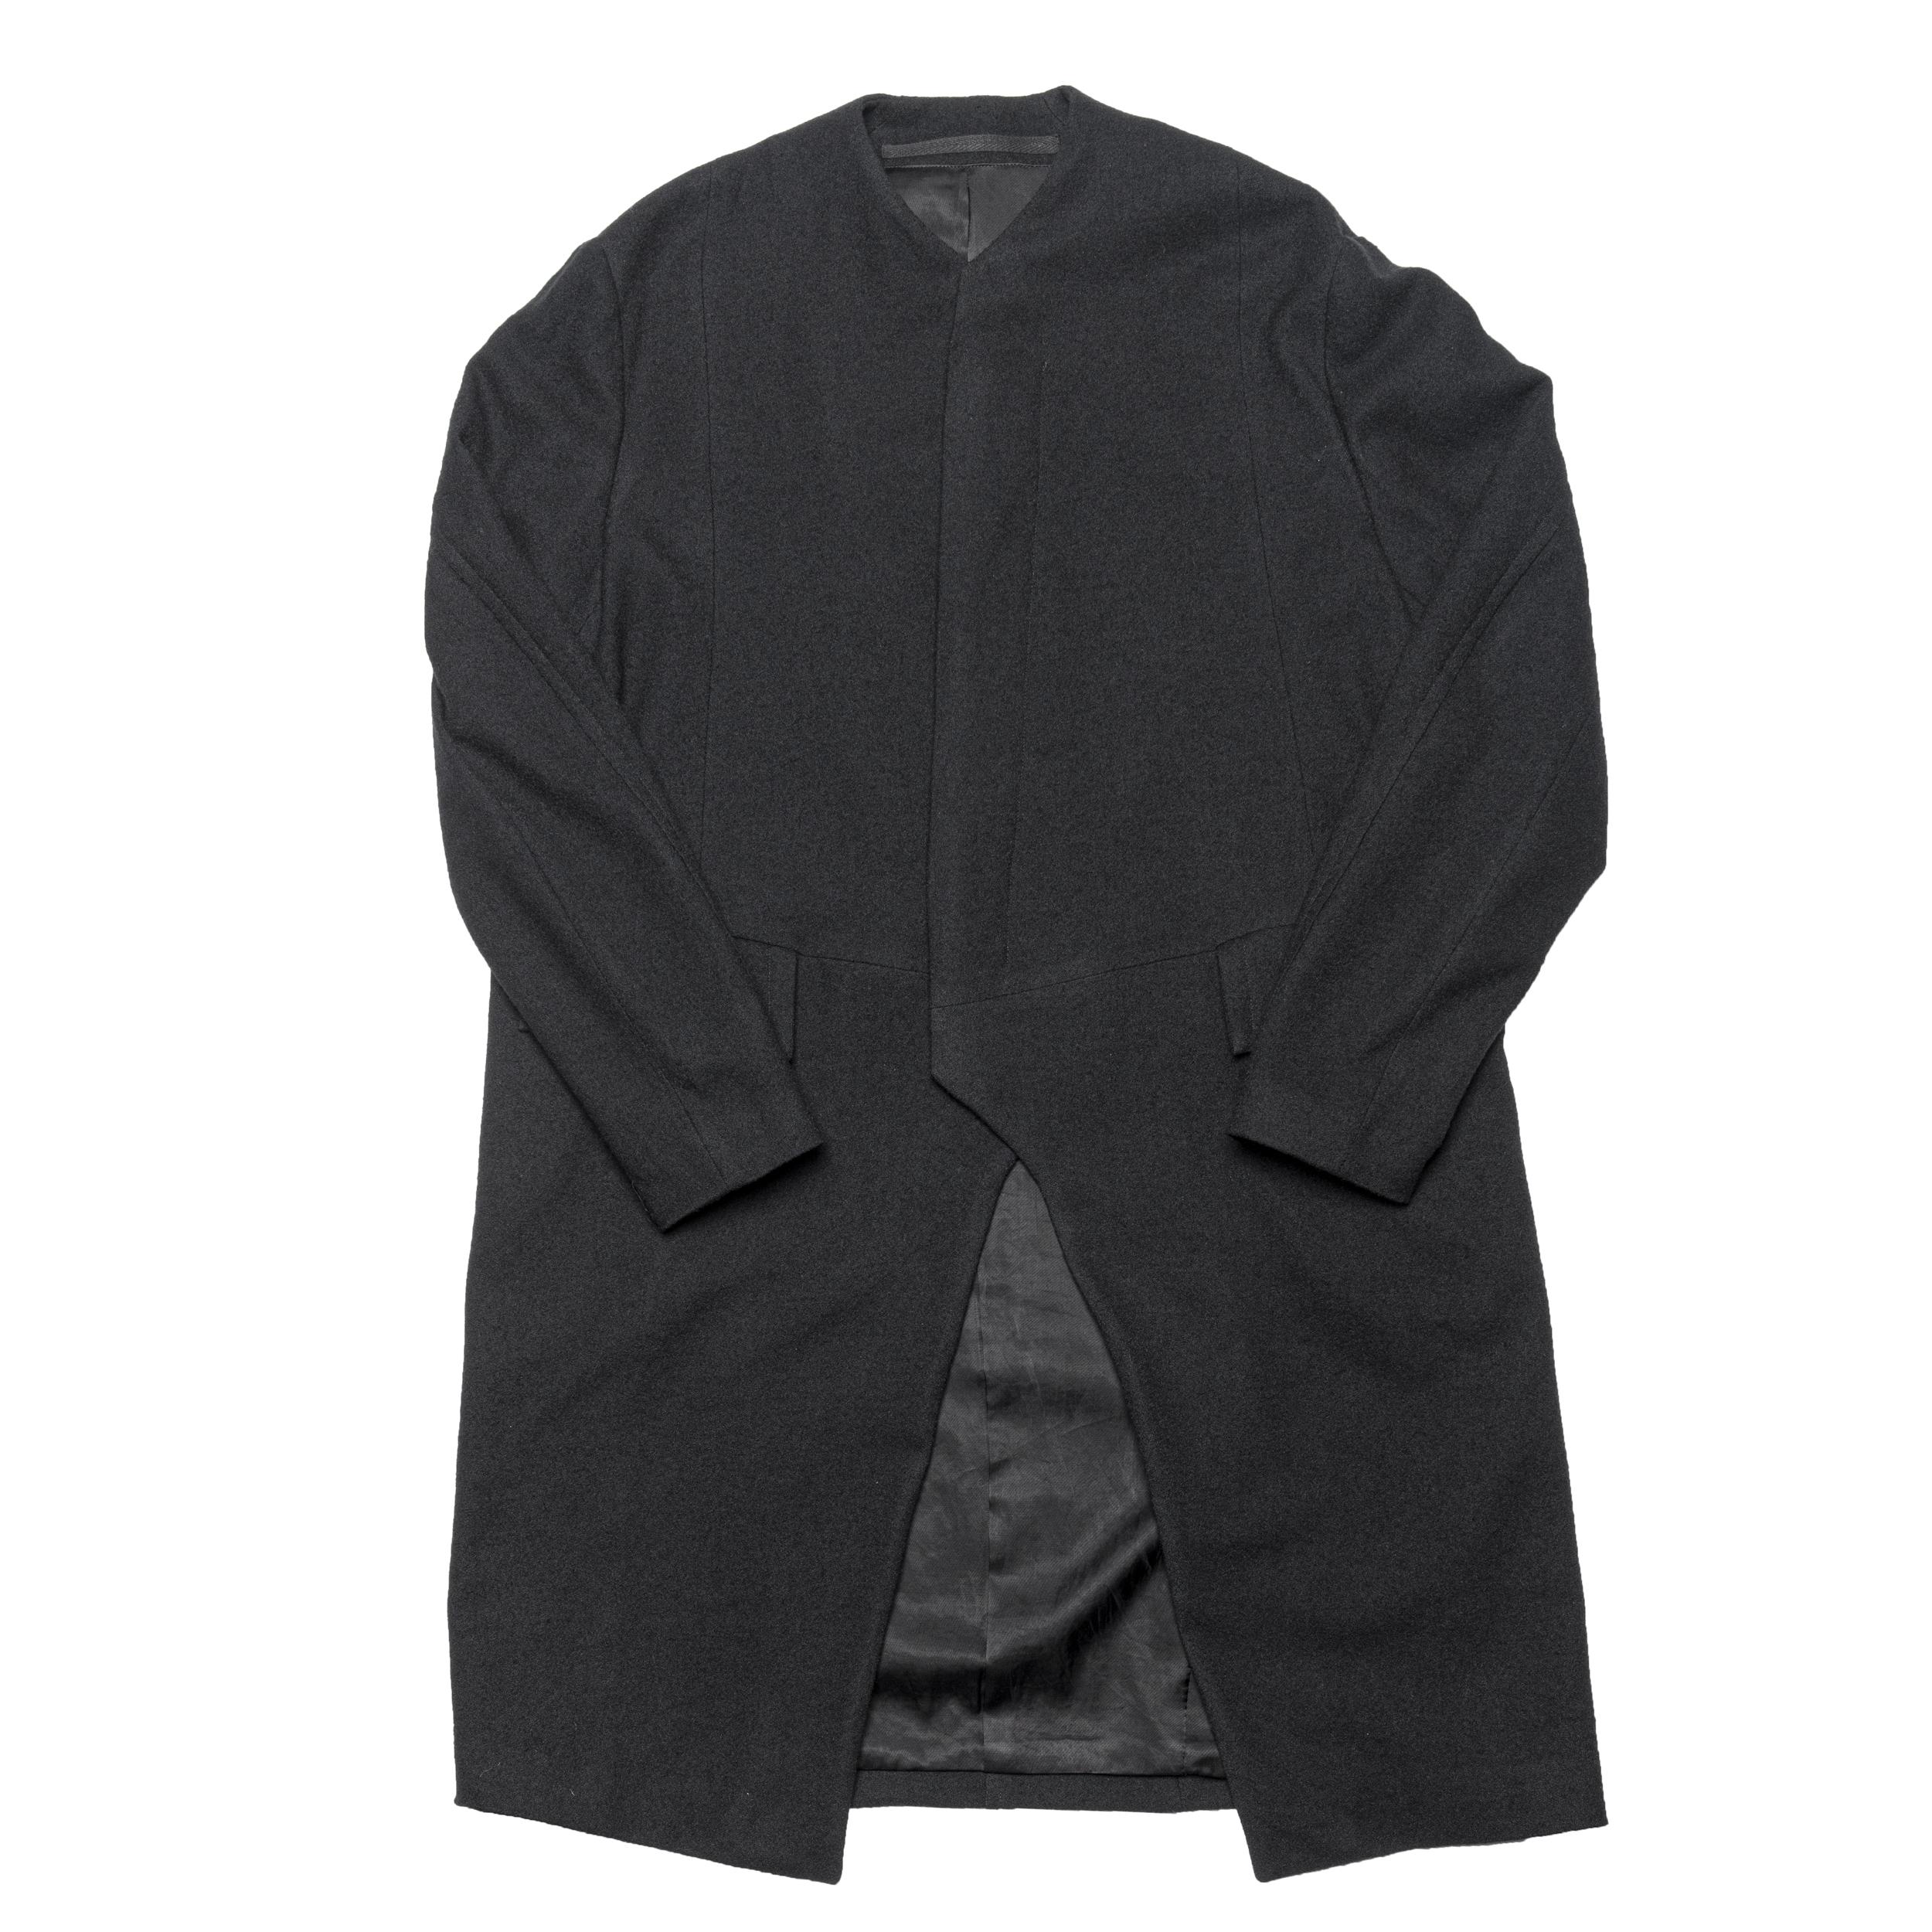 687JAM1-BLACK / カラーレステーラードジャケット